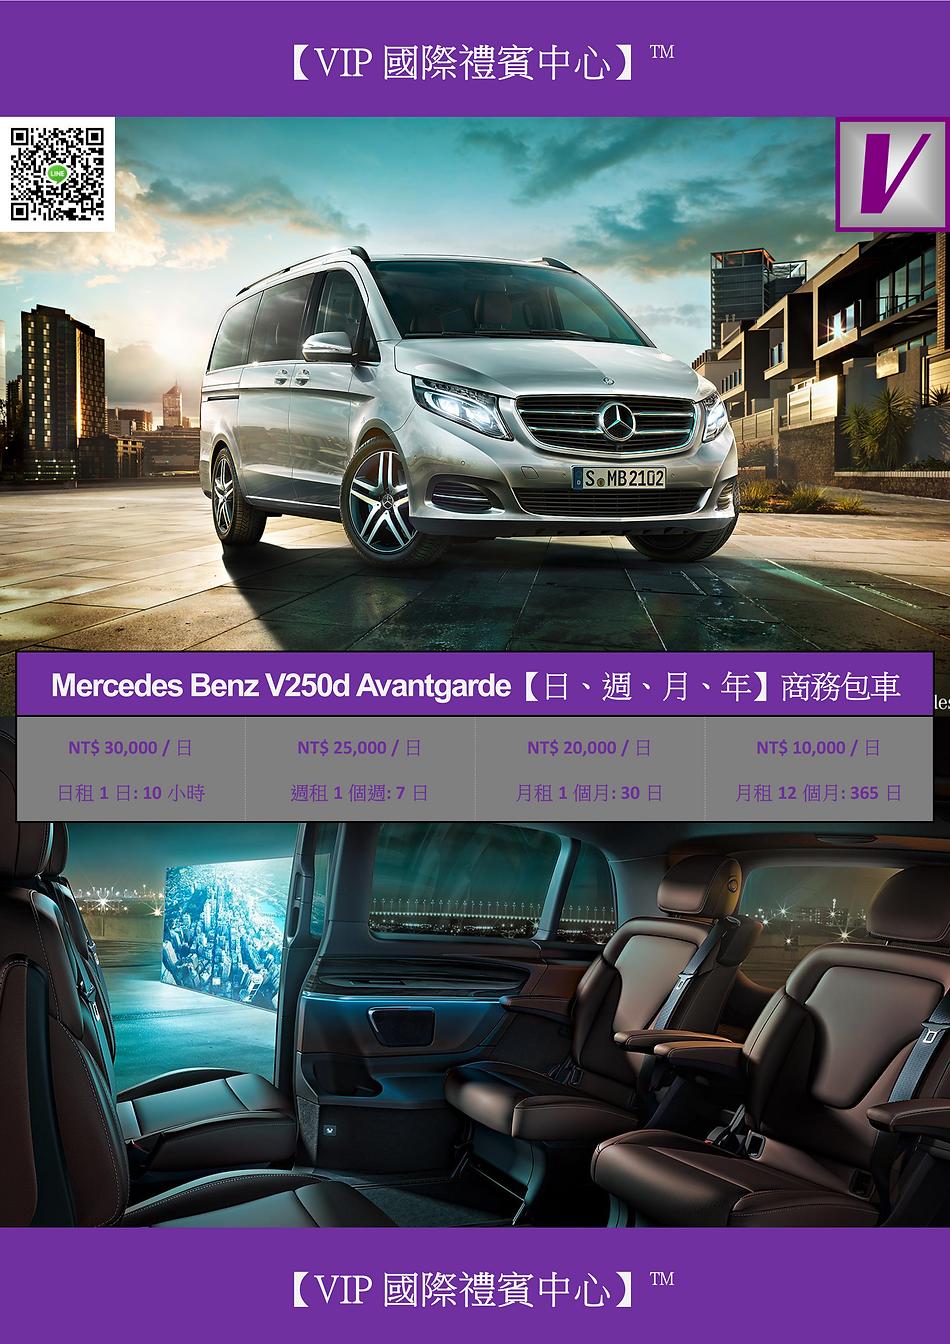 VIP國際禮賓中心 MERCEDES BENZ V250D AVANTGARDE W447 臺北市區接送包車